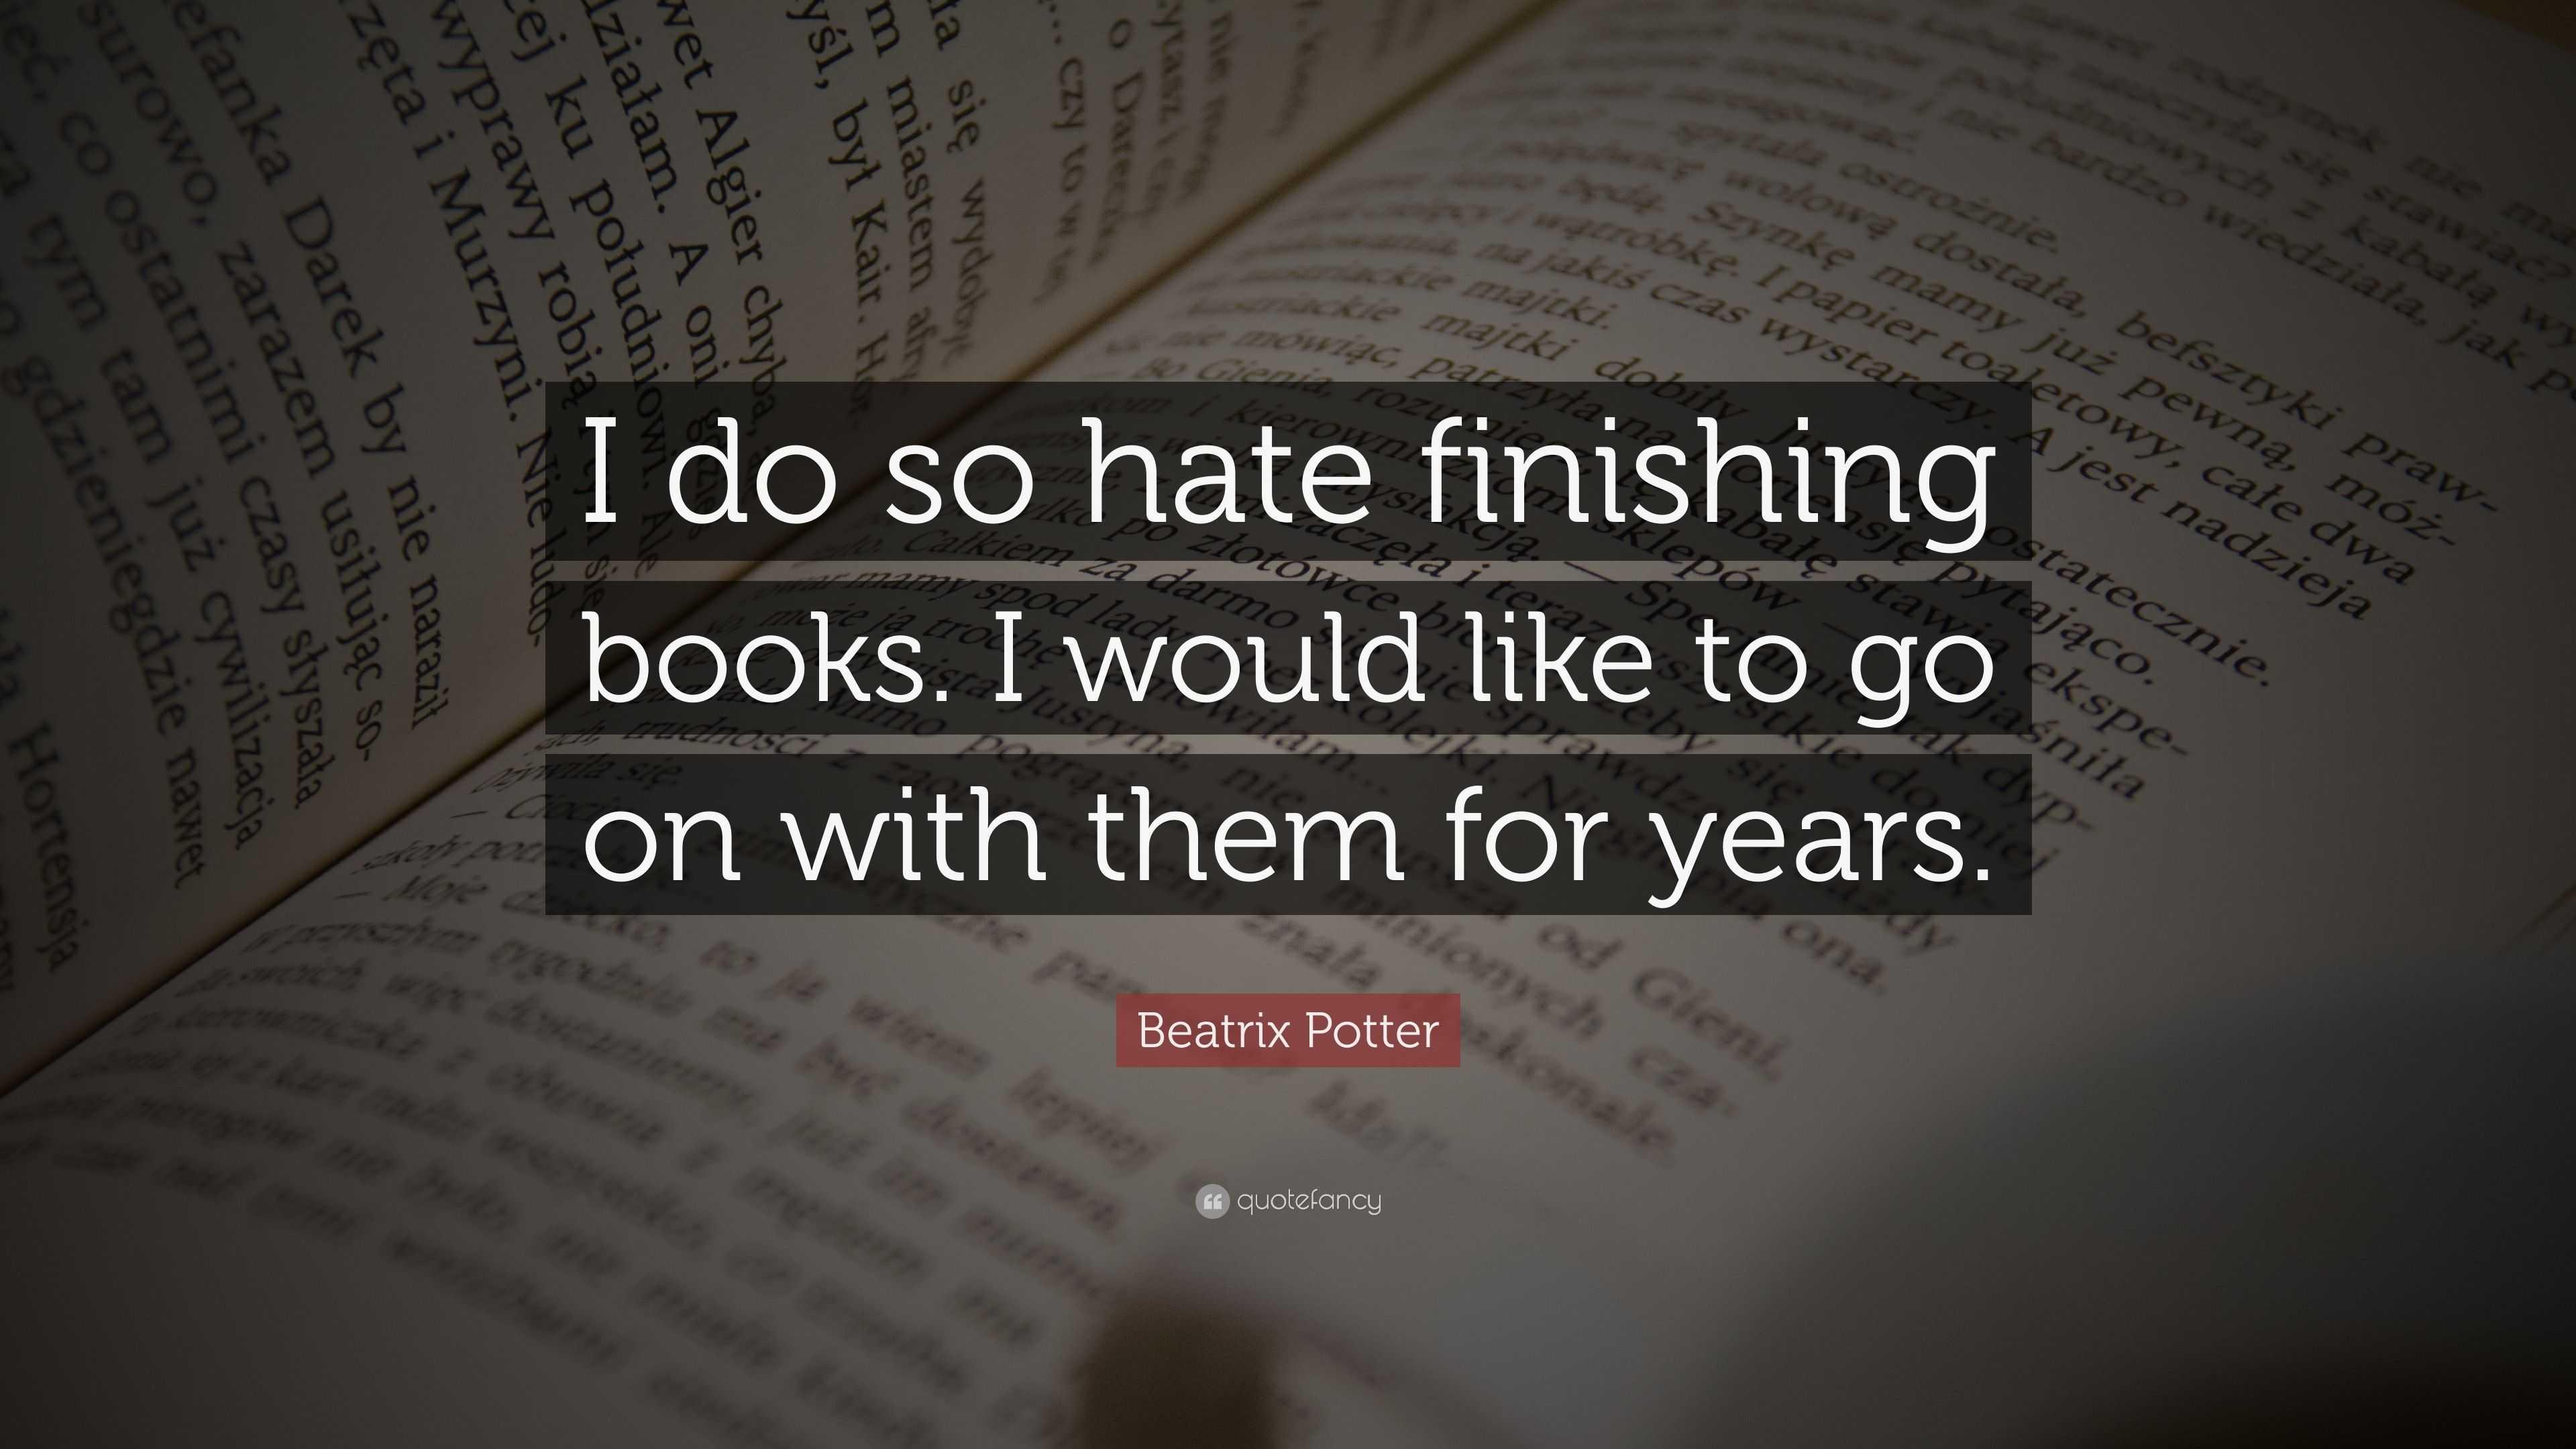 Beatrix Potter Quote: U201cI Do So Hate Finishing Books. I Would Like To